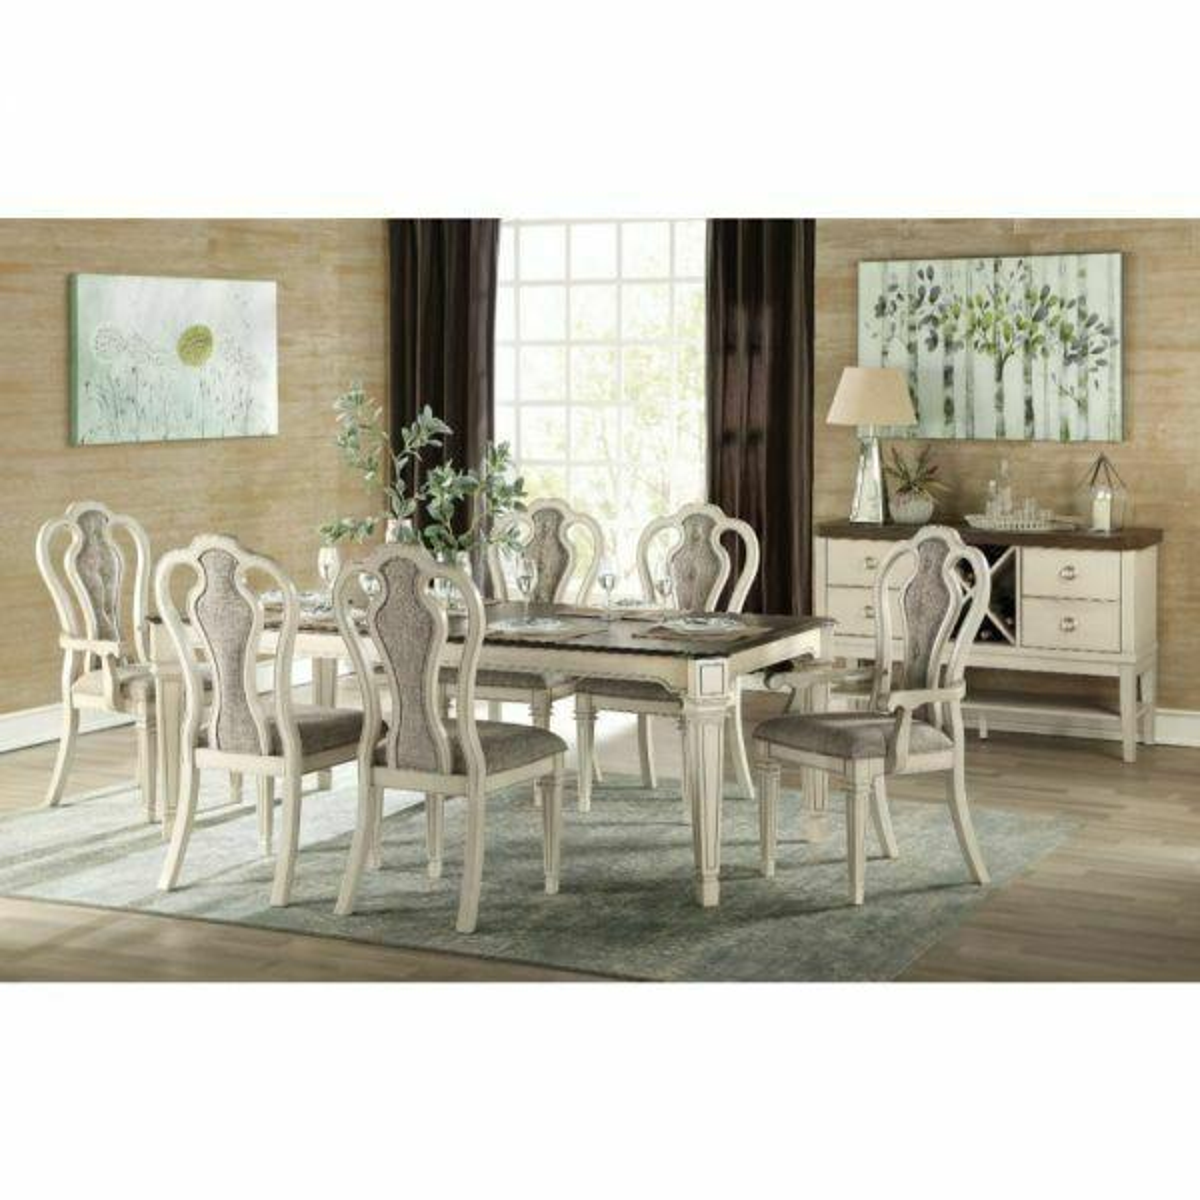 ACME Kayley Dining Table - 77135 - Antique White & Dark Oak